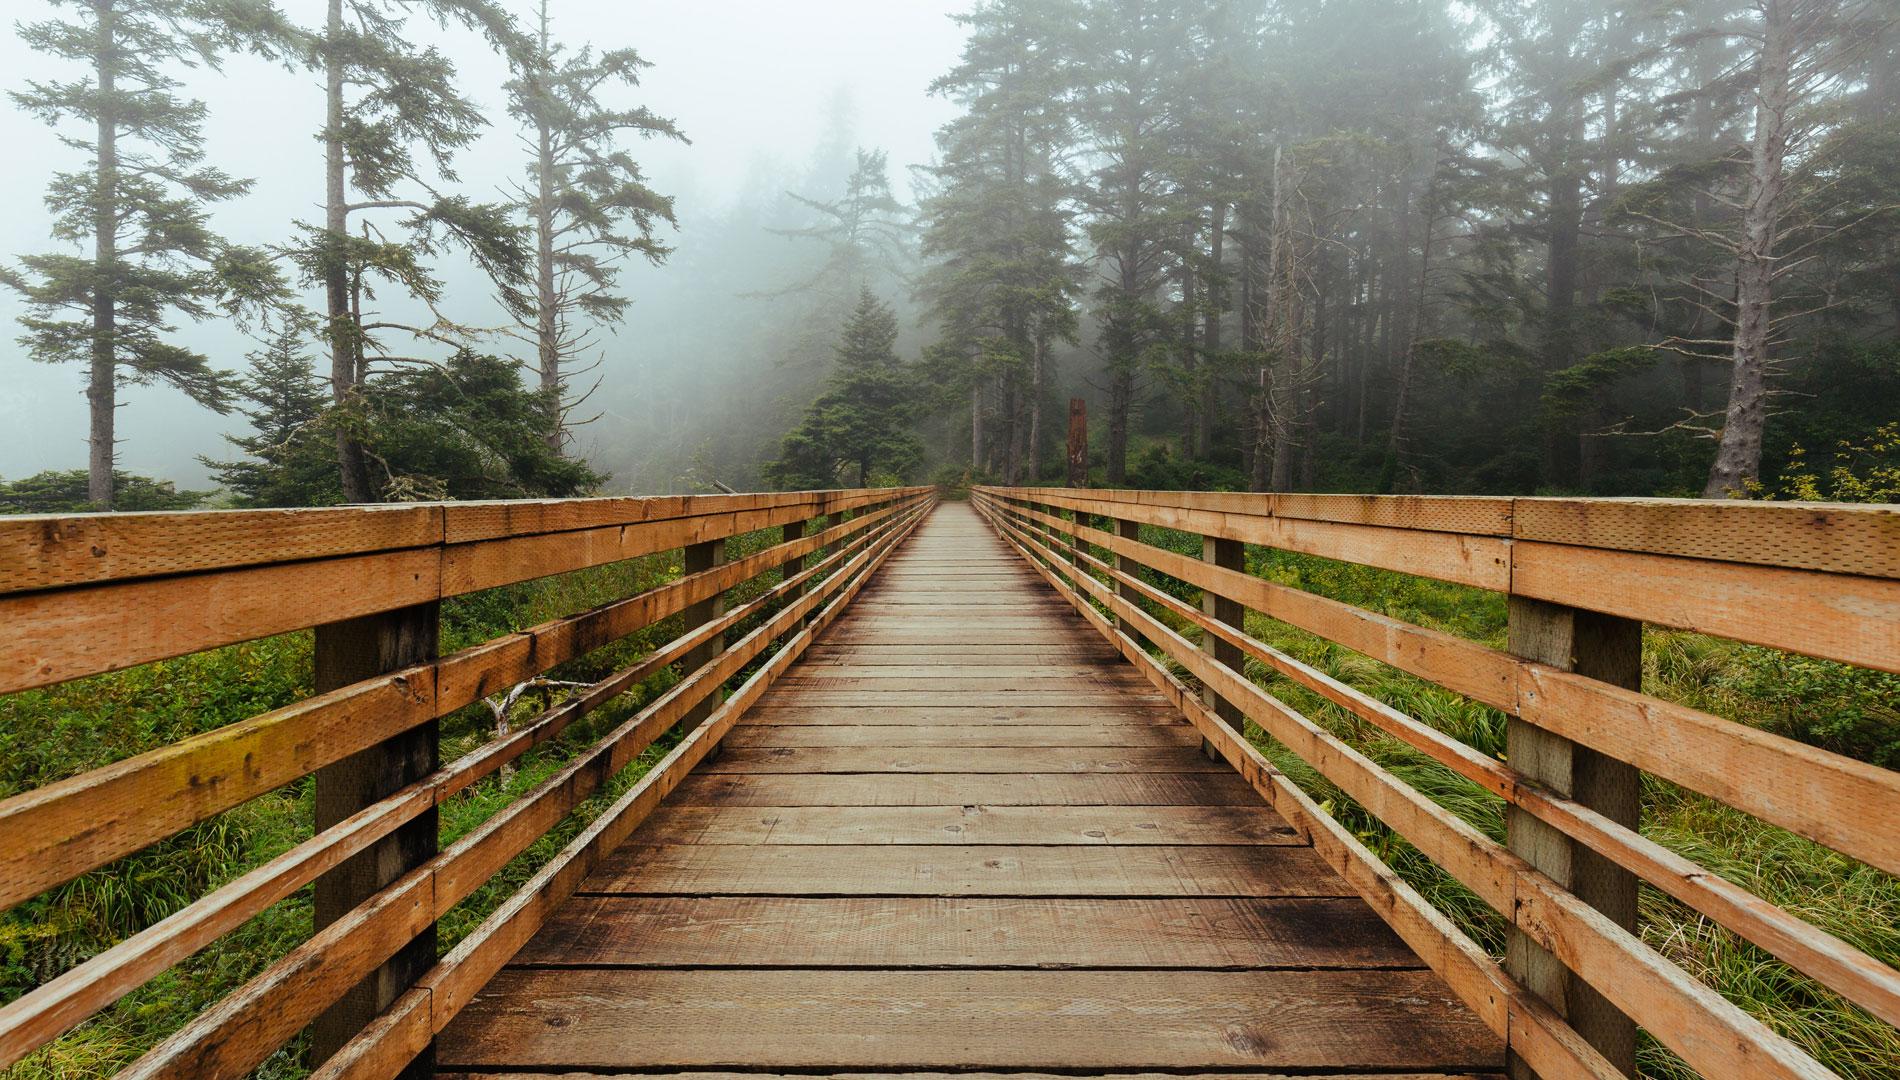 bridge in forest on foggy day in Washington